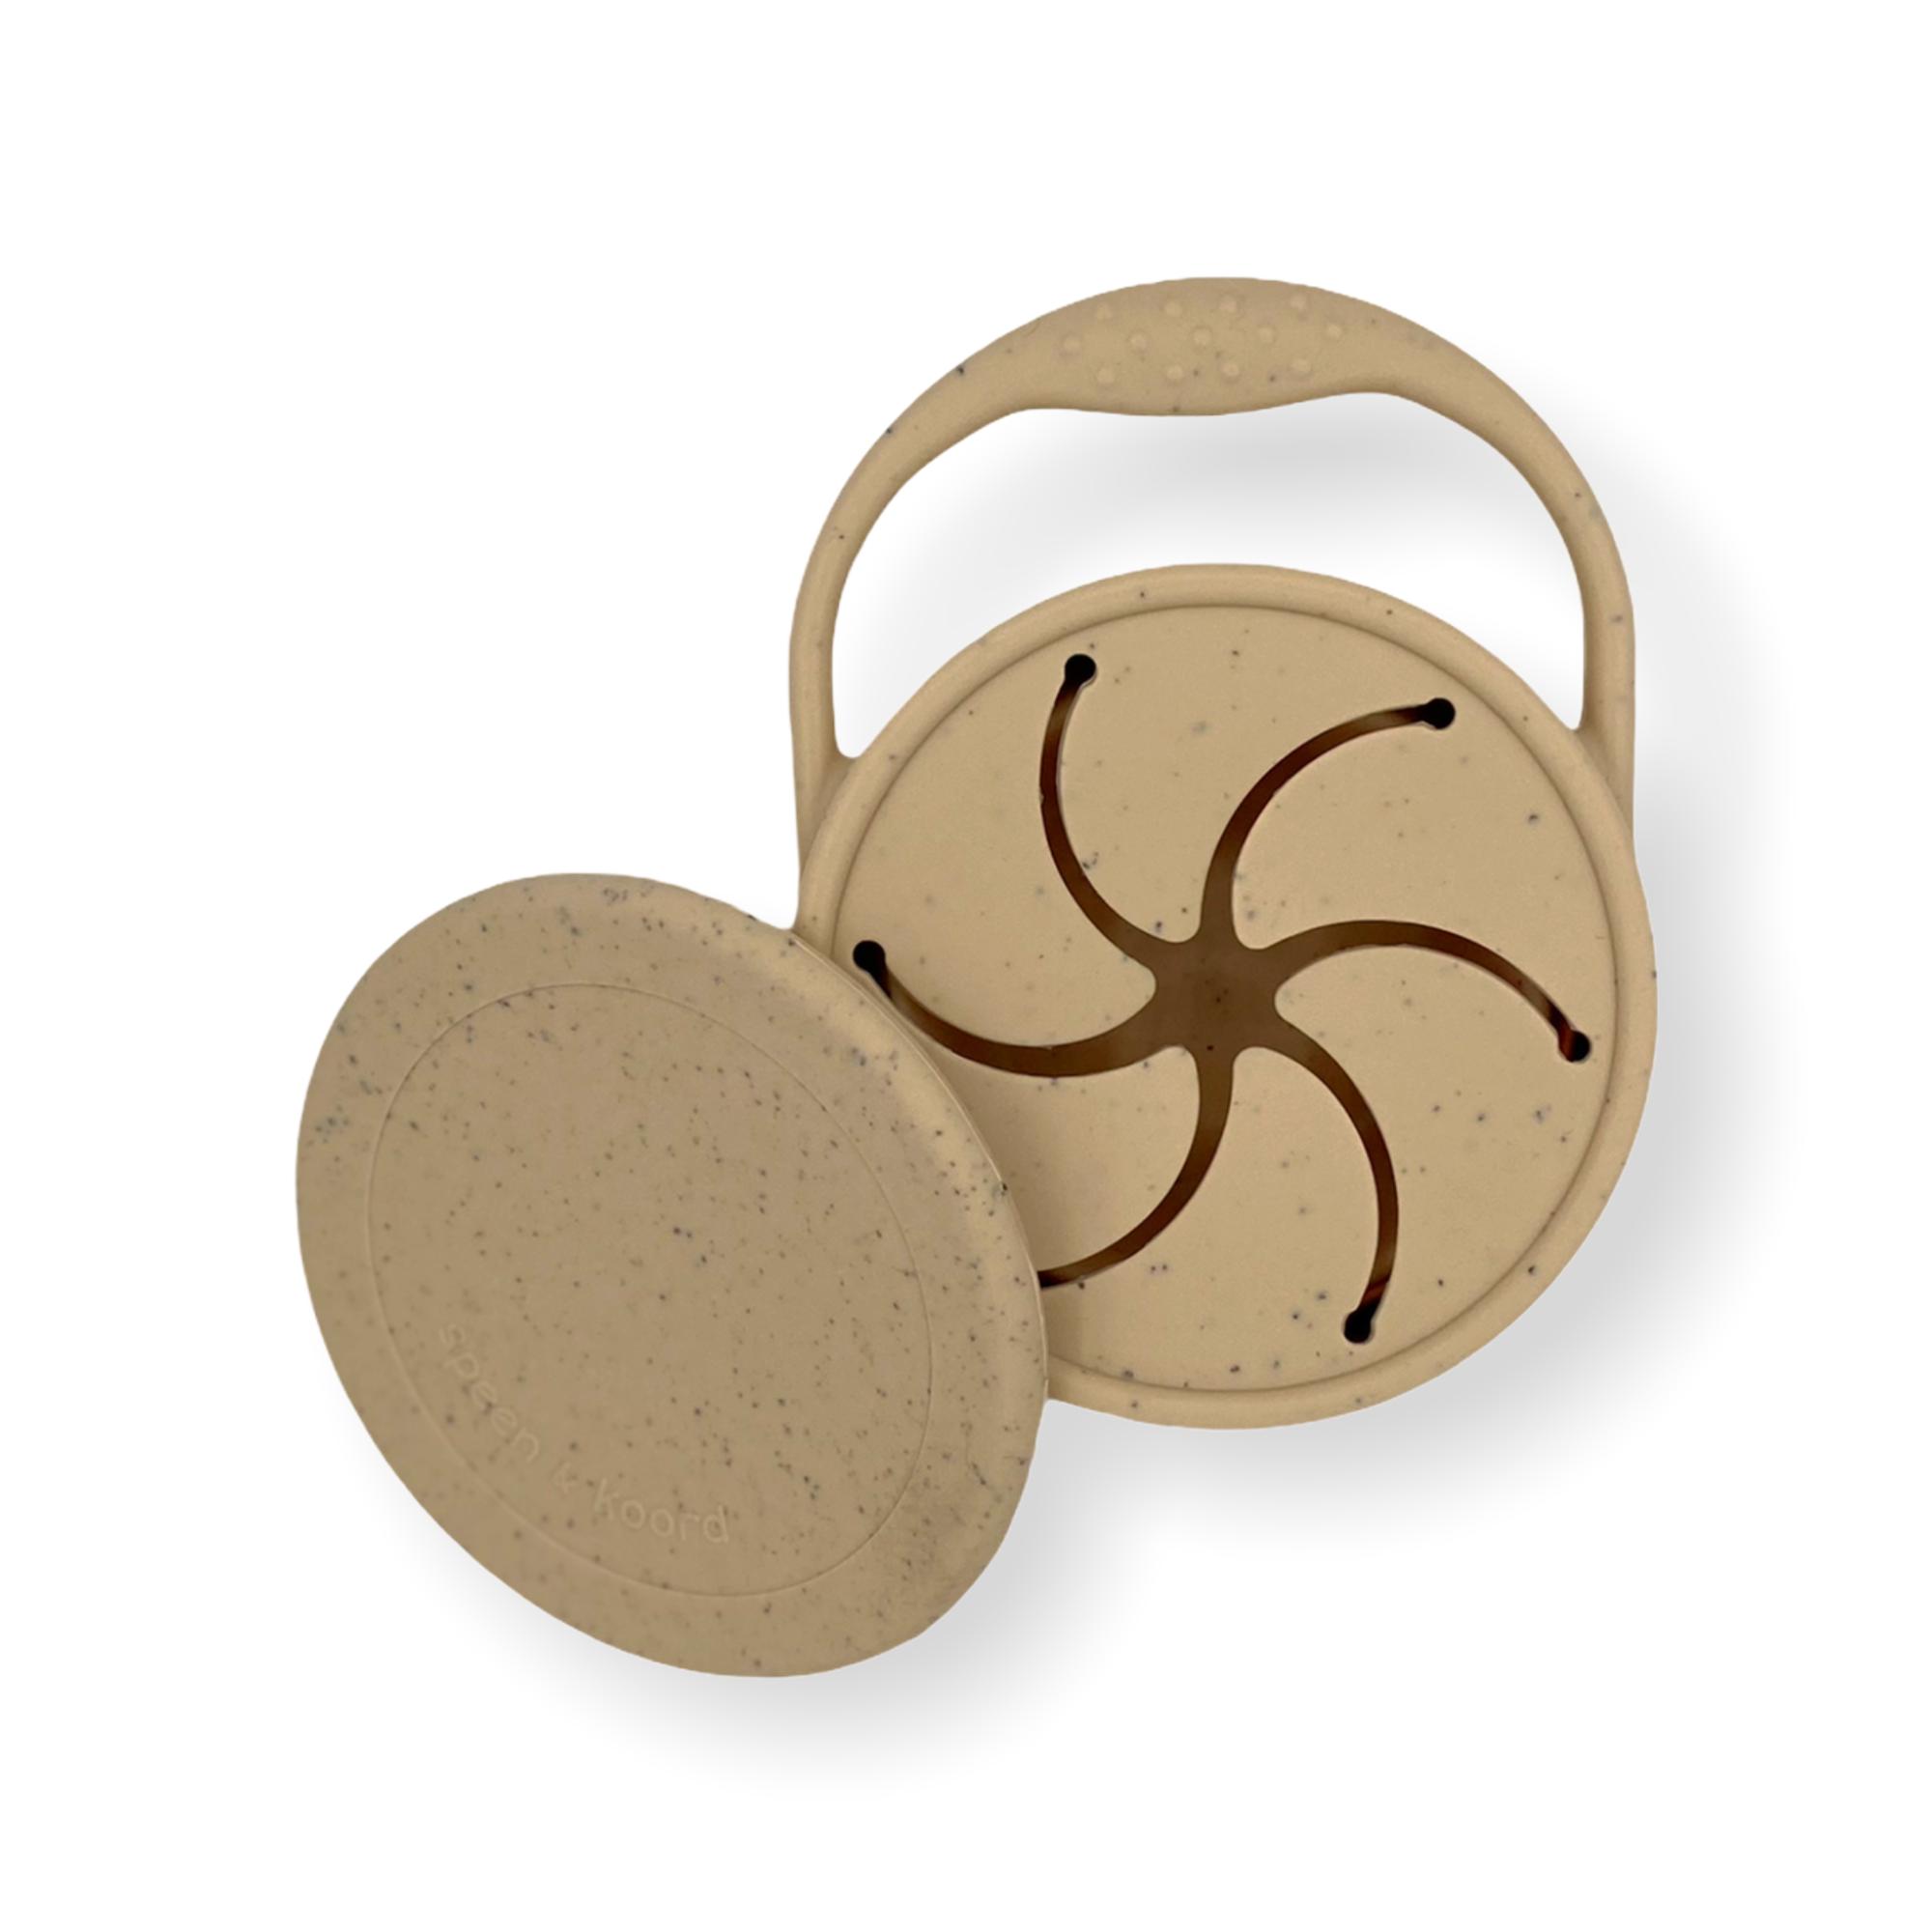 Afbeelding Speen & Koord Snack cups I Speckled Sand